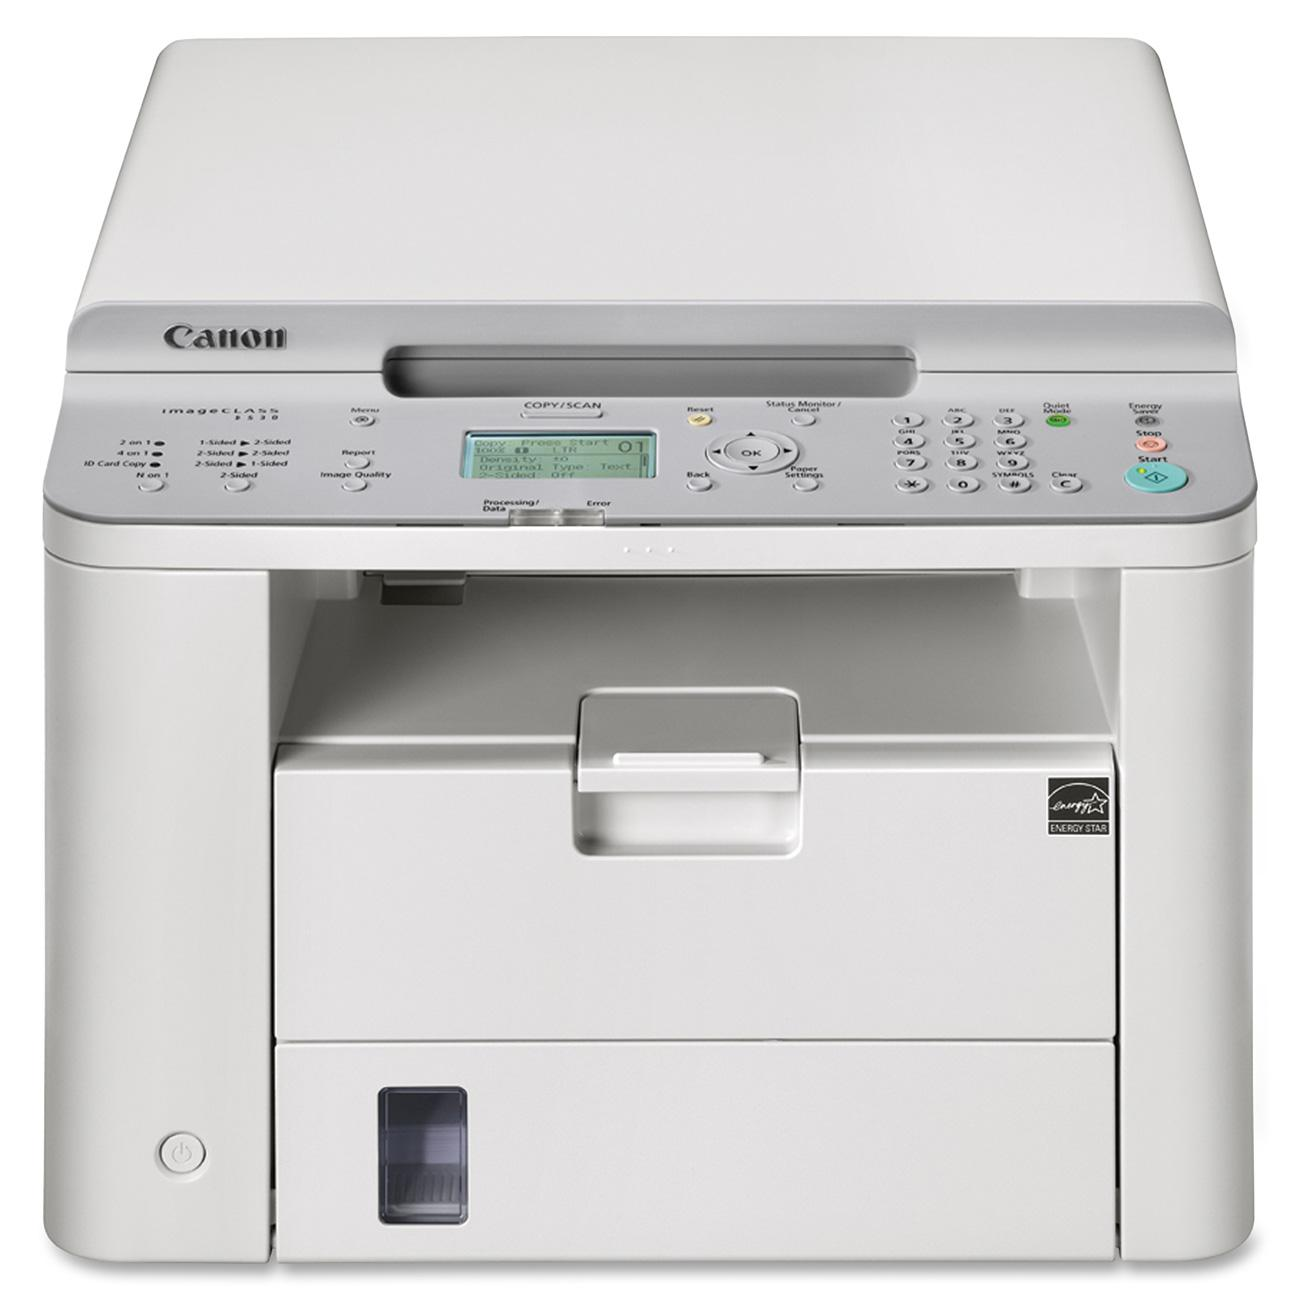 ICD530 Monochrome Lsr Multifunction Printer